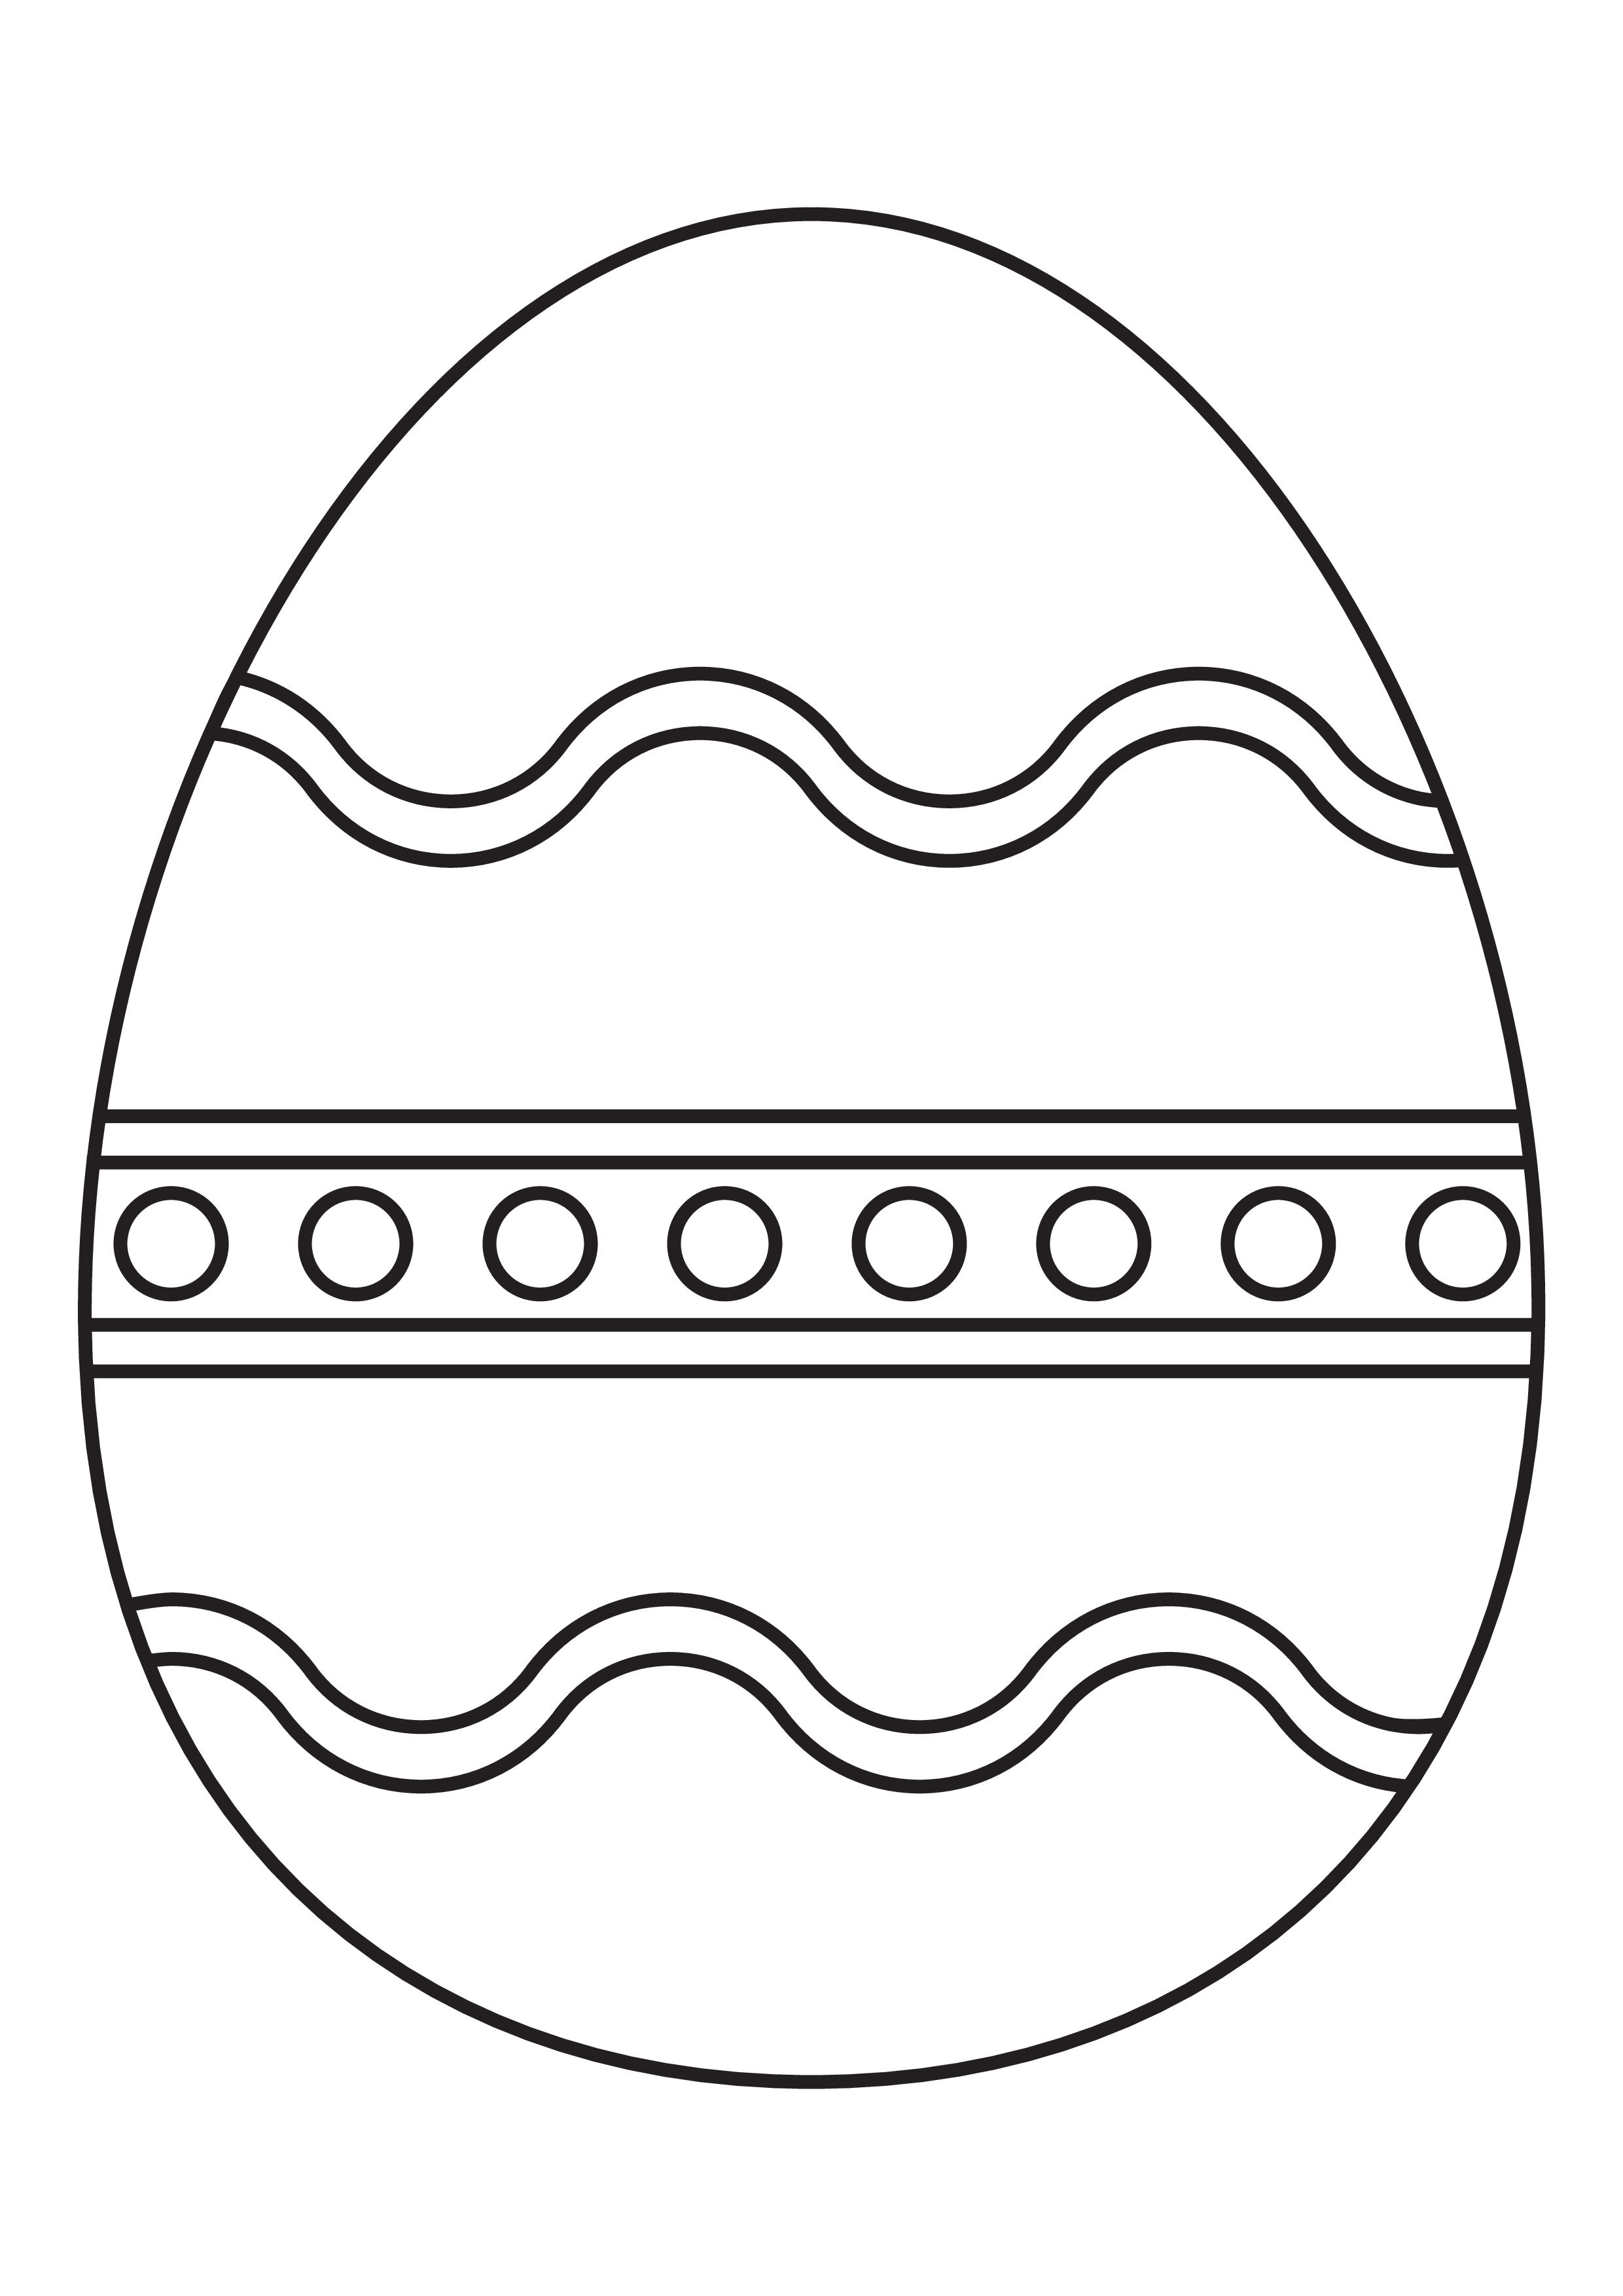 Kleurplaten: 5 Inkleurbare paas eieren